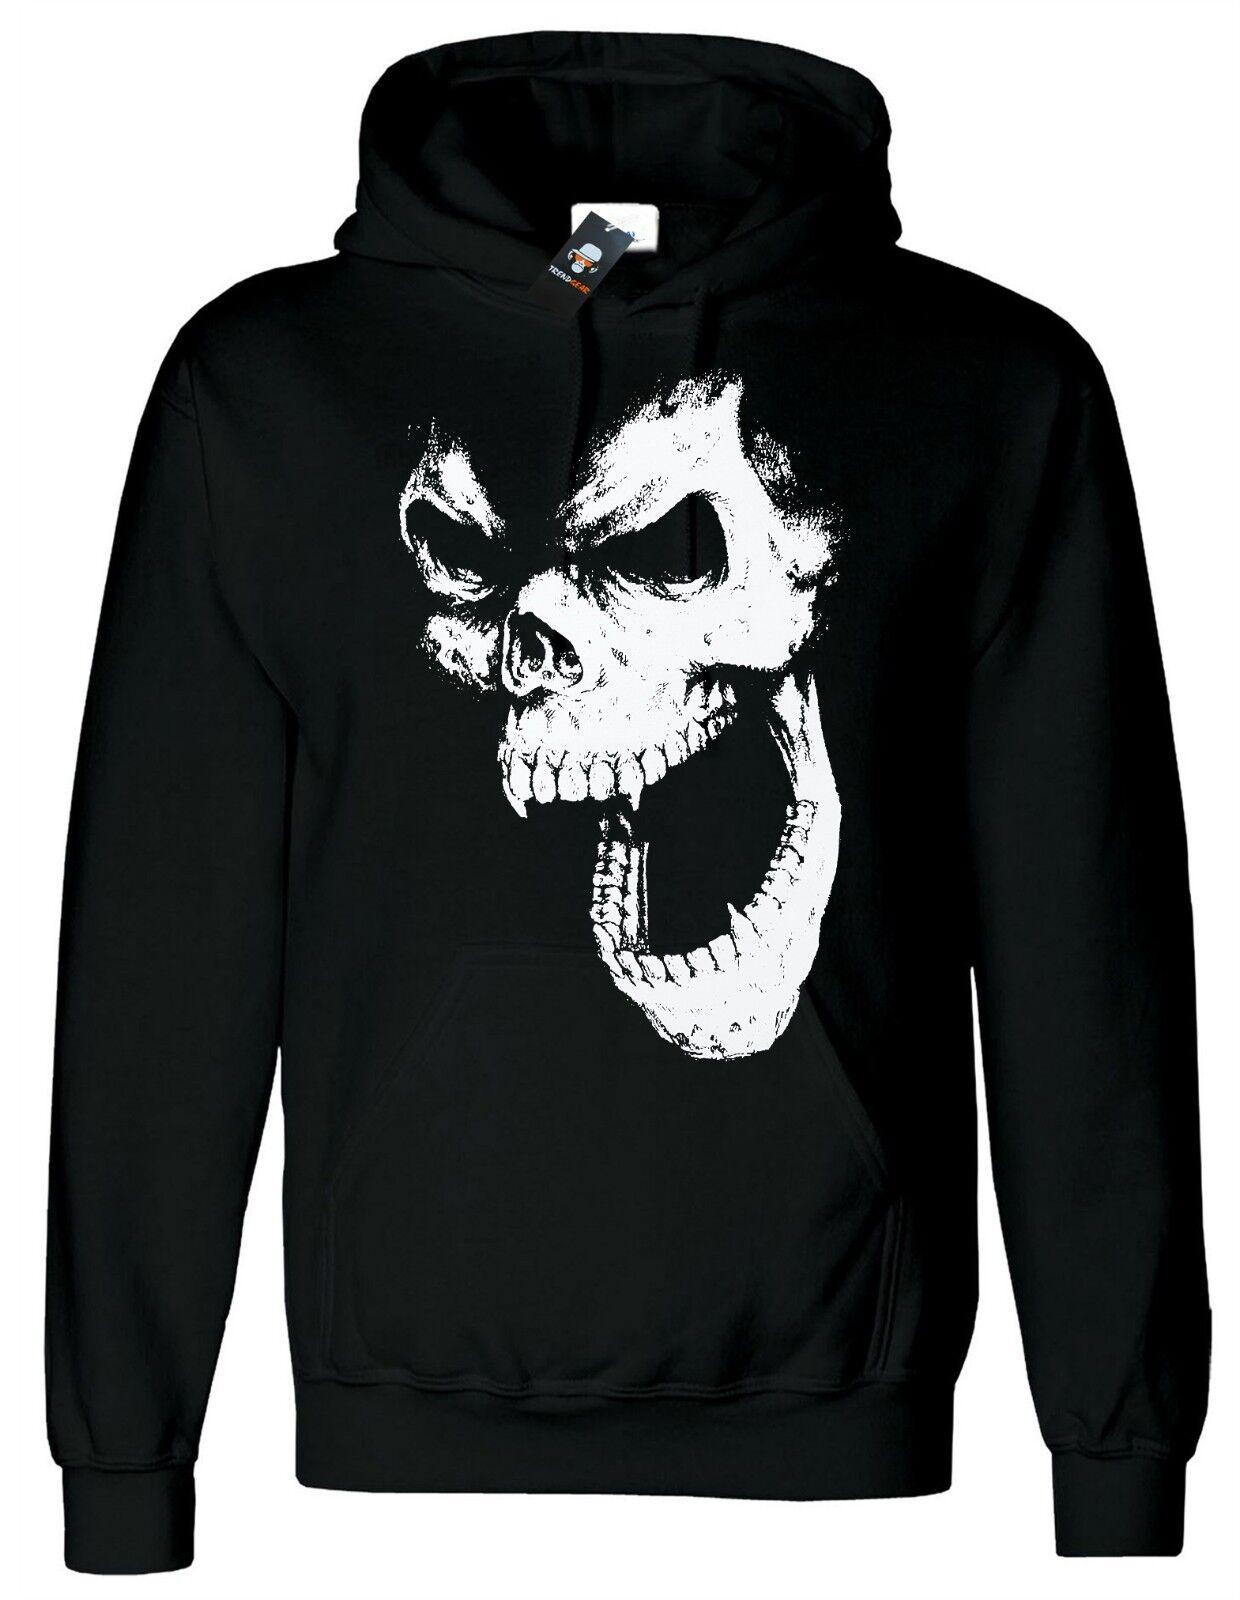 SKULL OUT Hoody Vampire Halloween Gothic Metal Goth Punk Hood Christmas XS-4XL